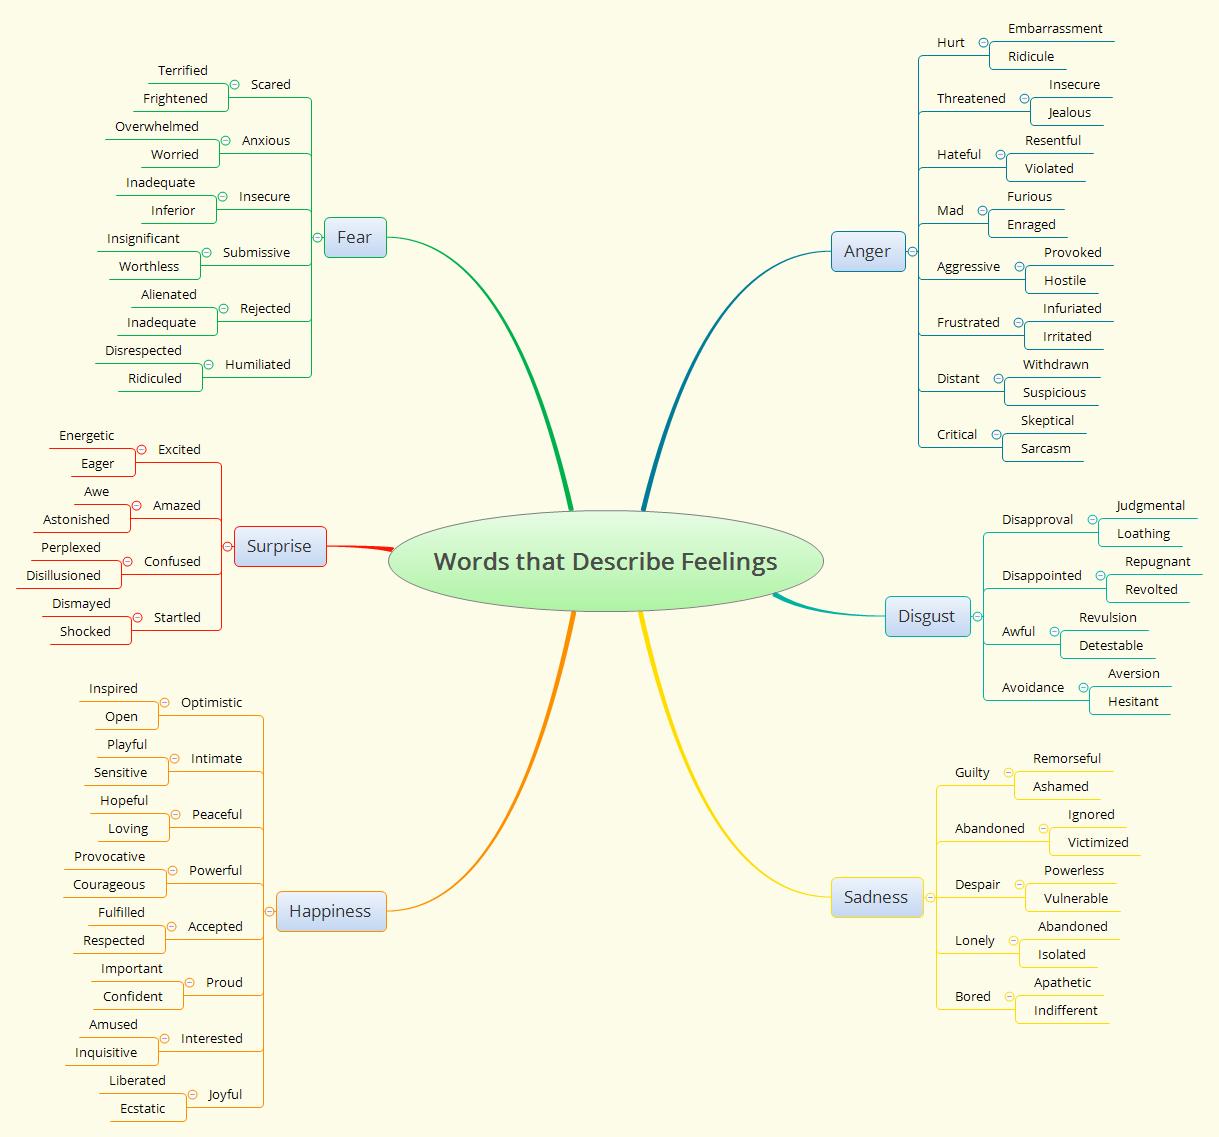 Words that Describe Feelings